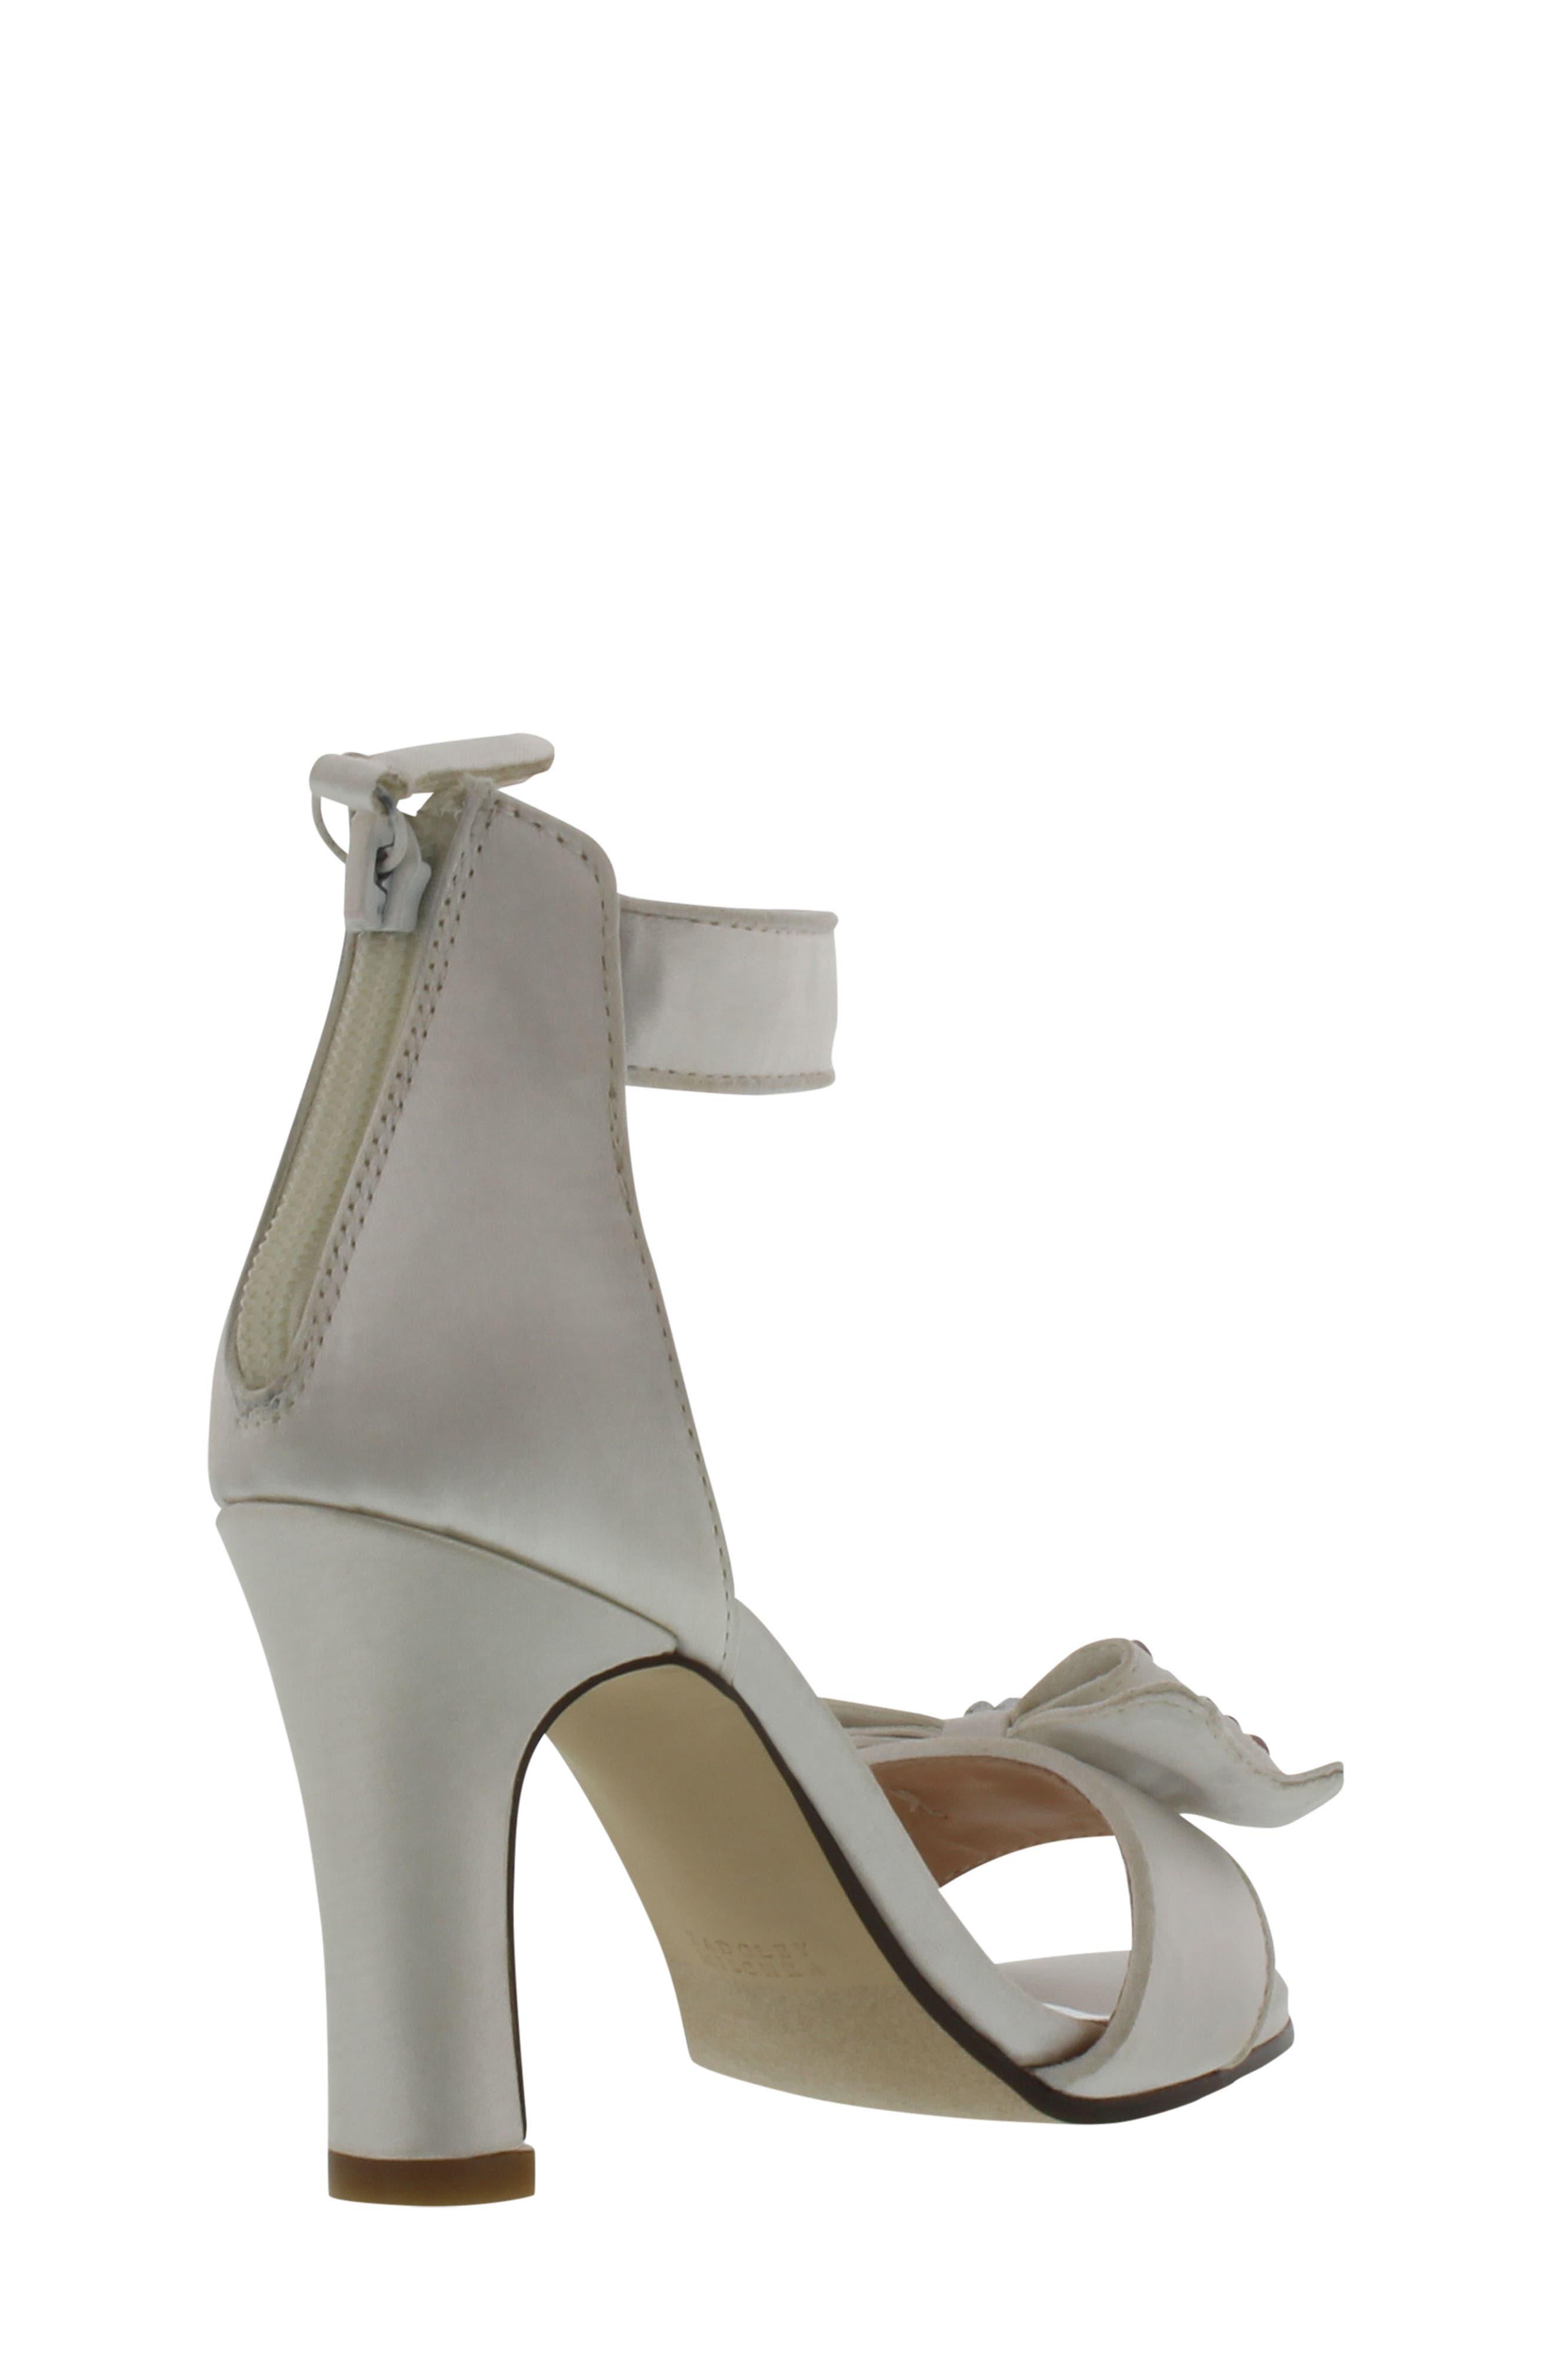 Kendall Embellished Bow Sandal,                             Alternate thumbnail 2, color,                             White Multi